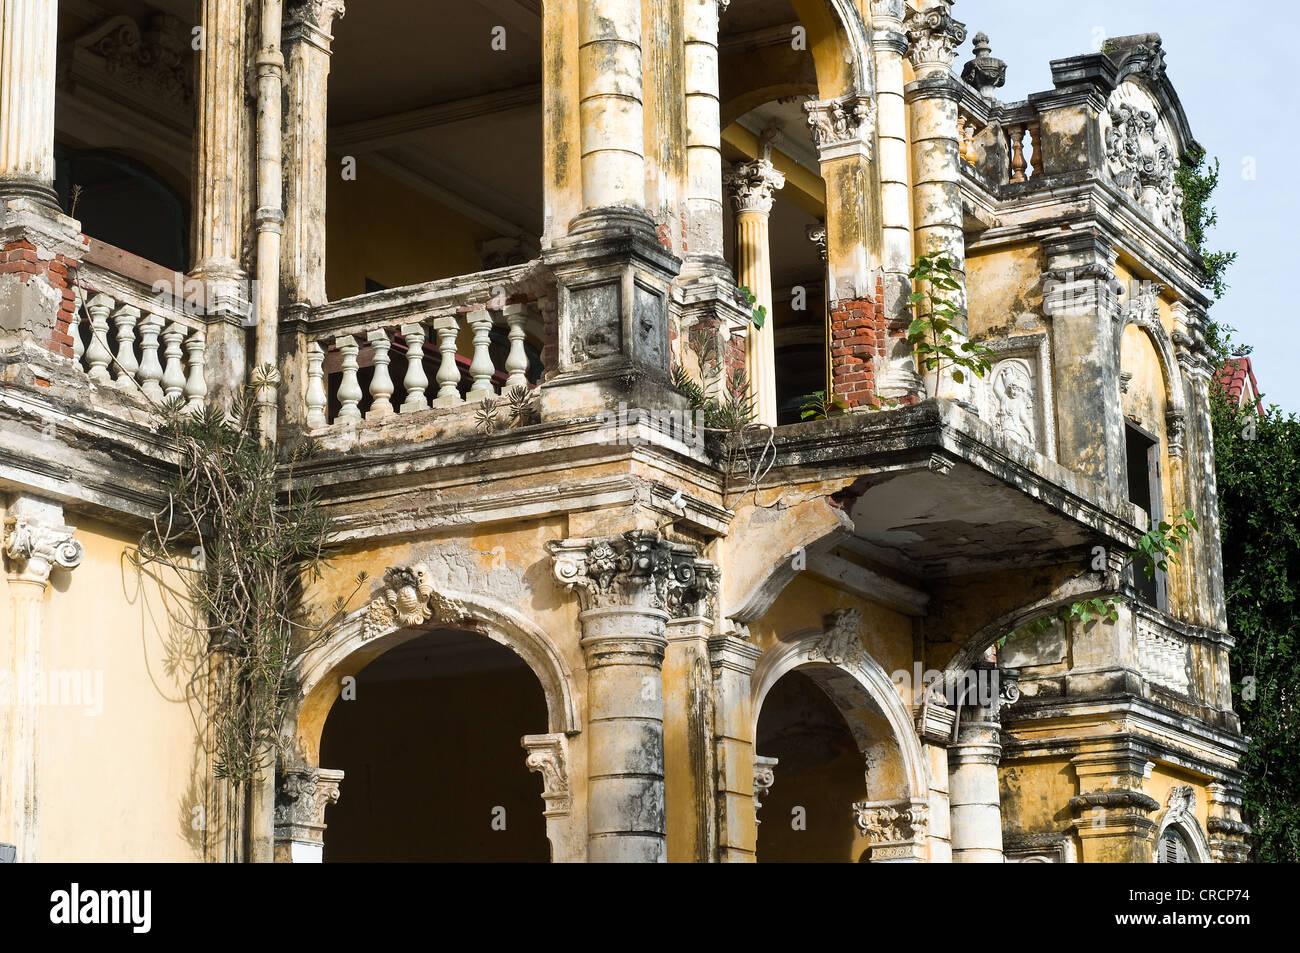 download Introduction to Latin America: Twenty First Century